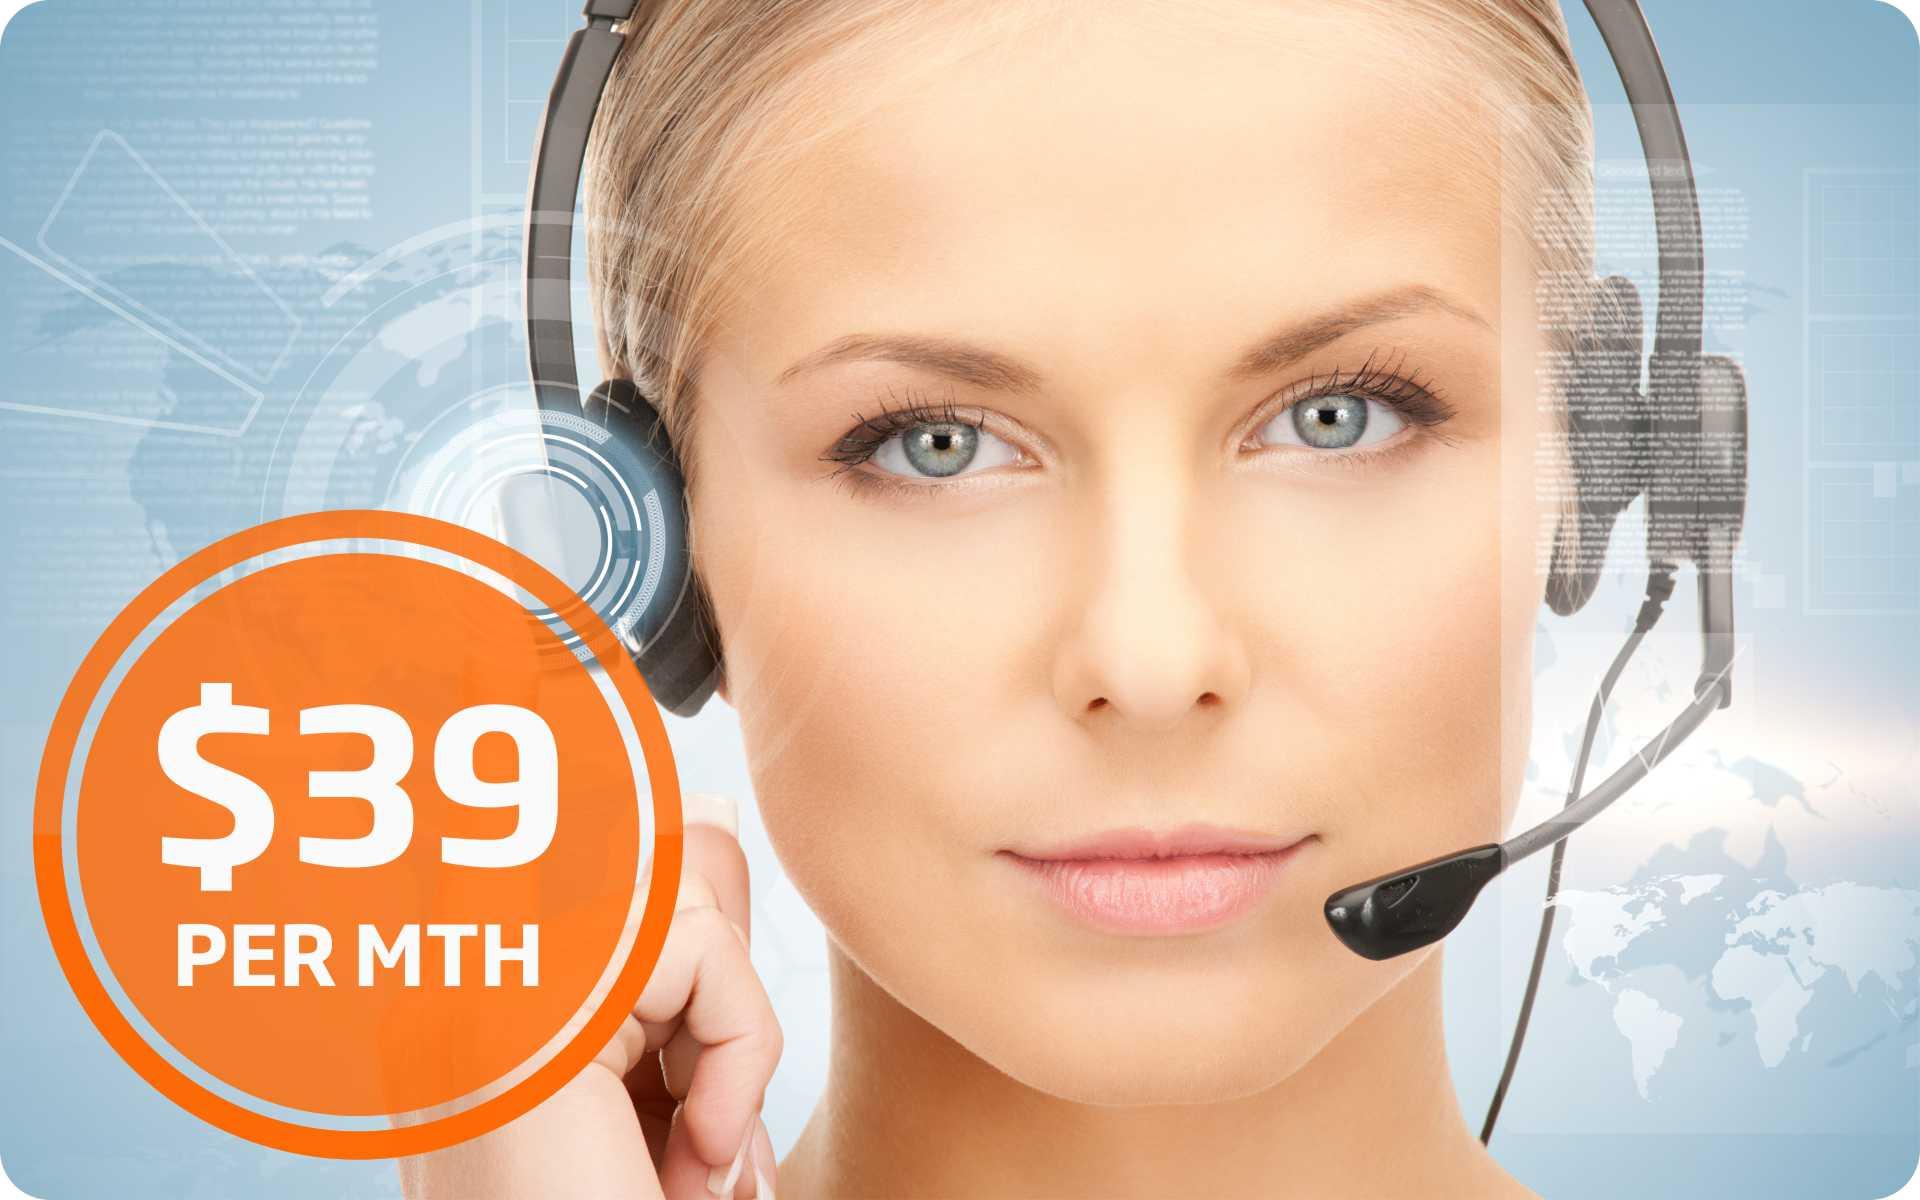 telephone-answering-services-live-phone-answering-service-australia-BUNDLE-130418.jpg